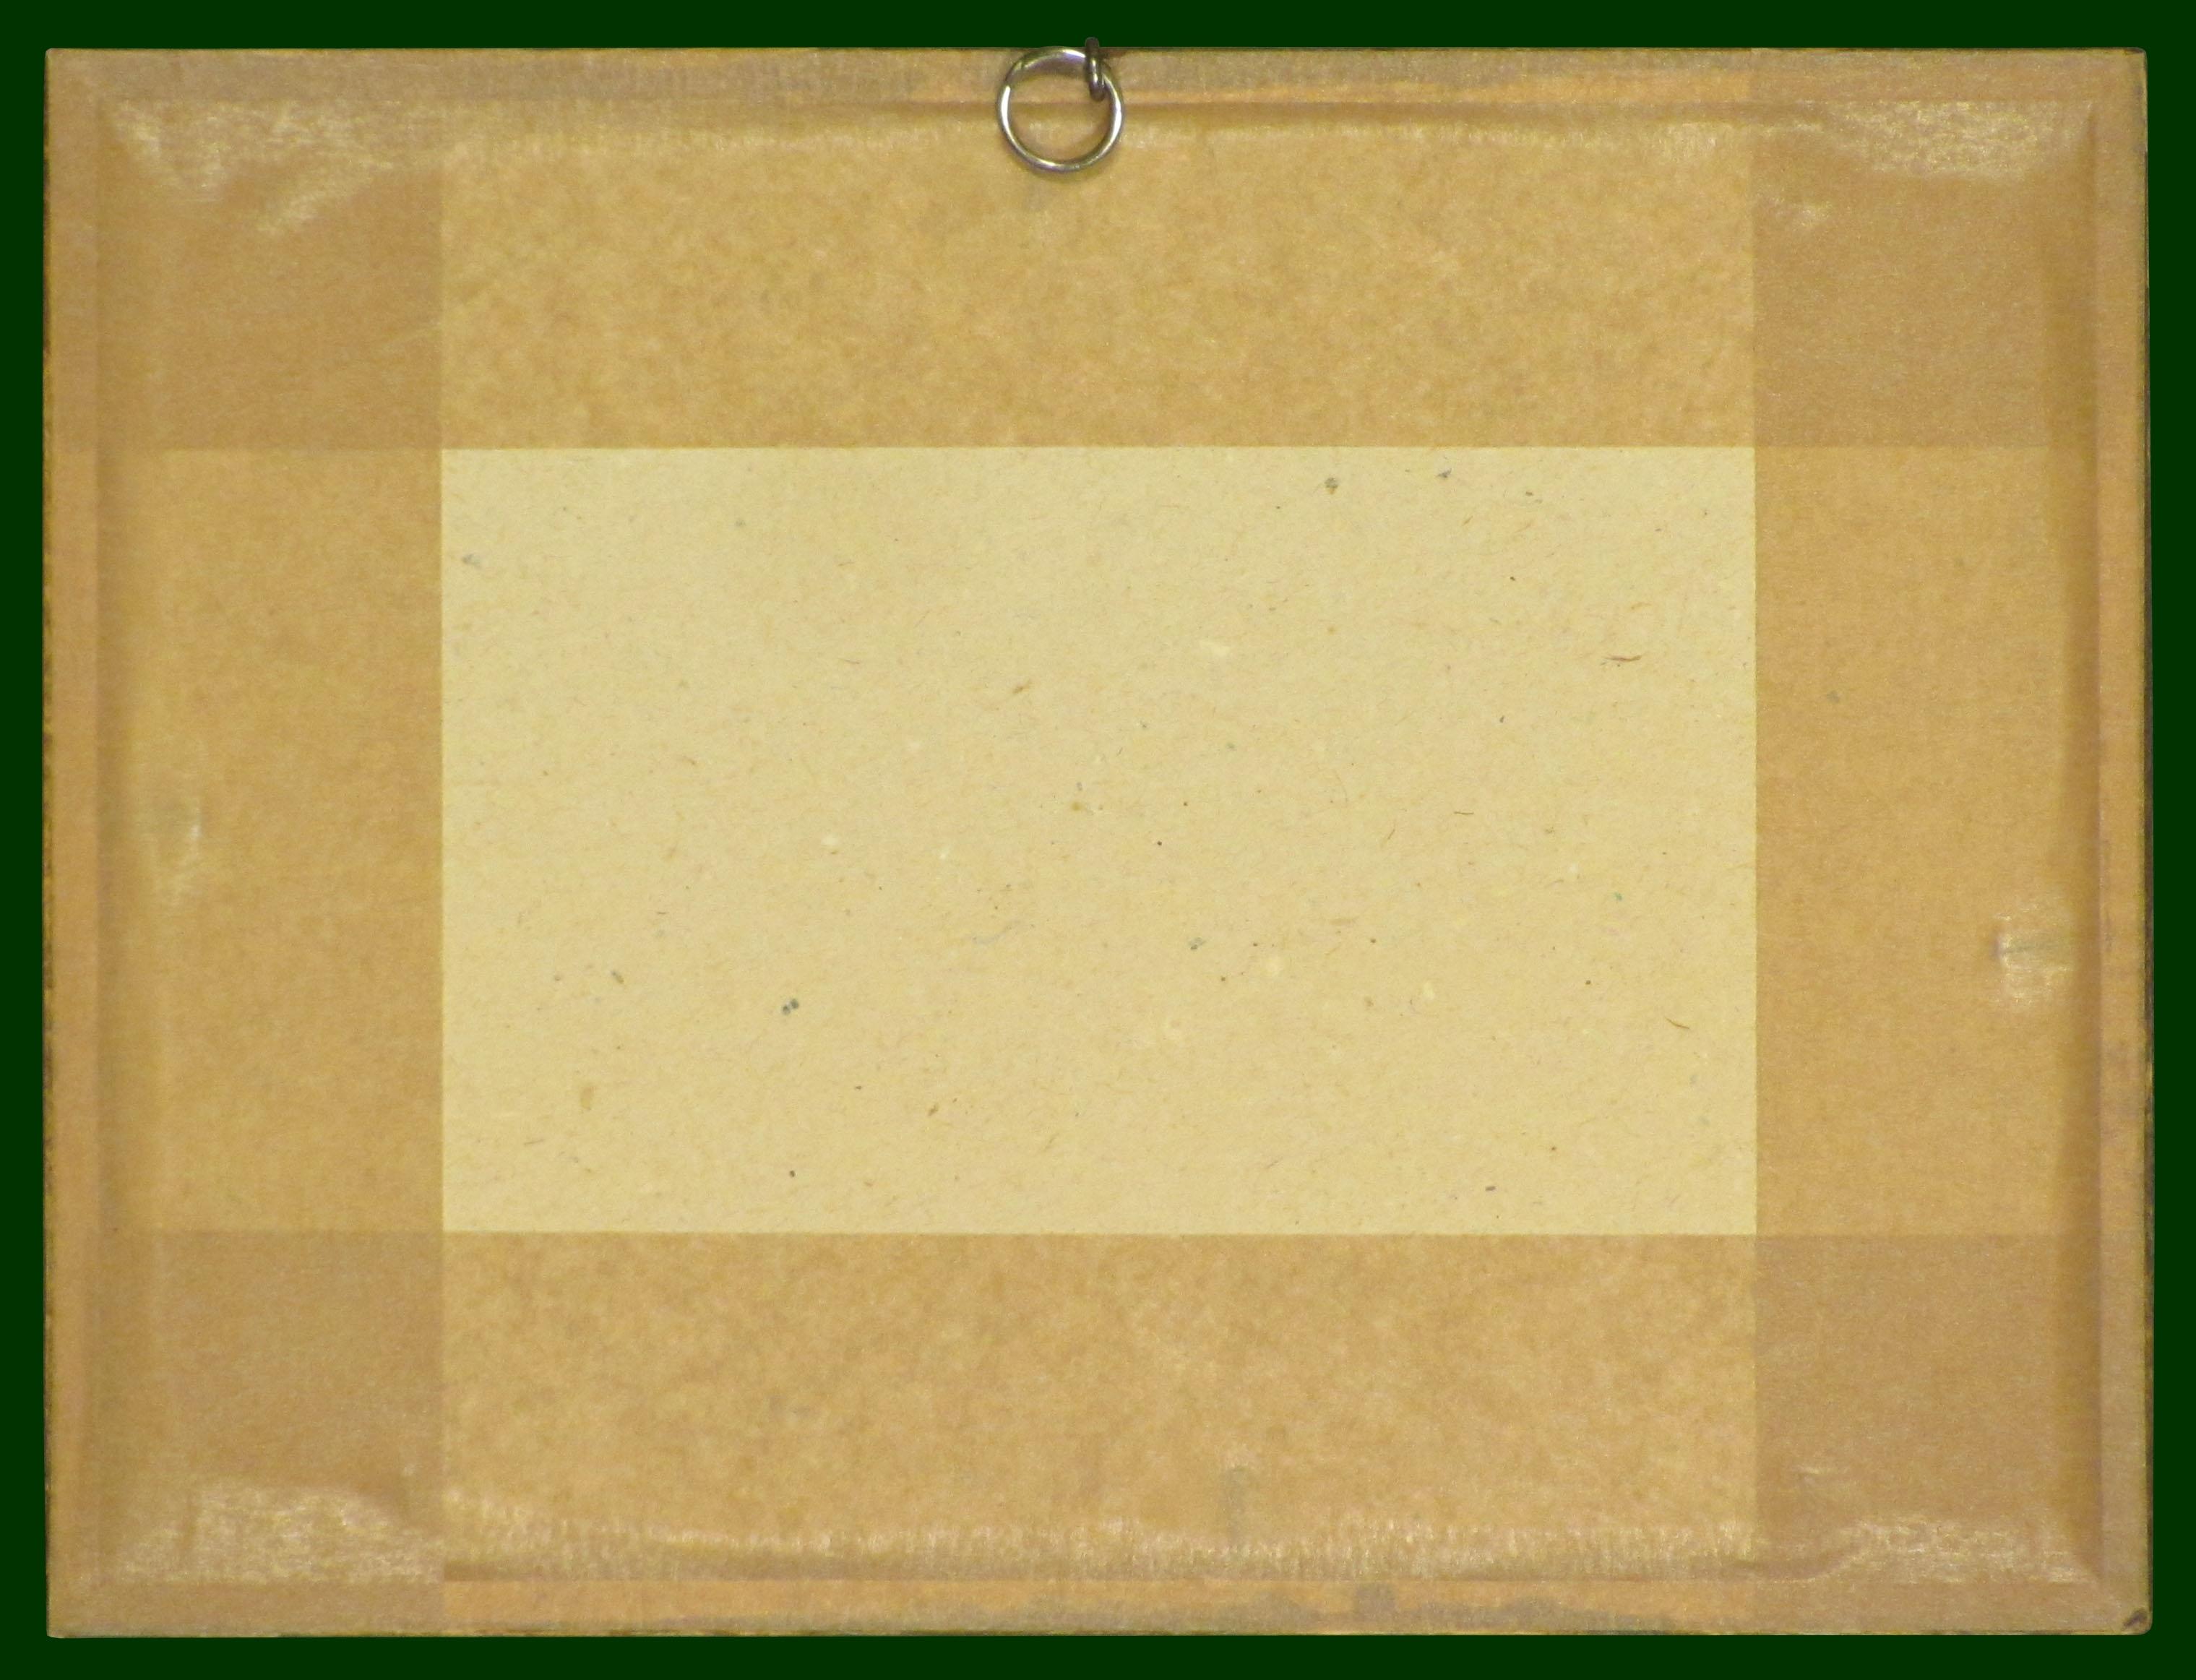 104-21hát.jpg (3039×2325)